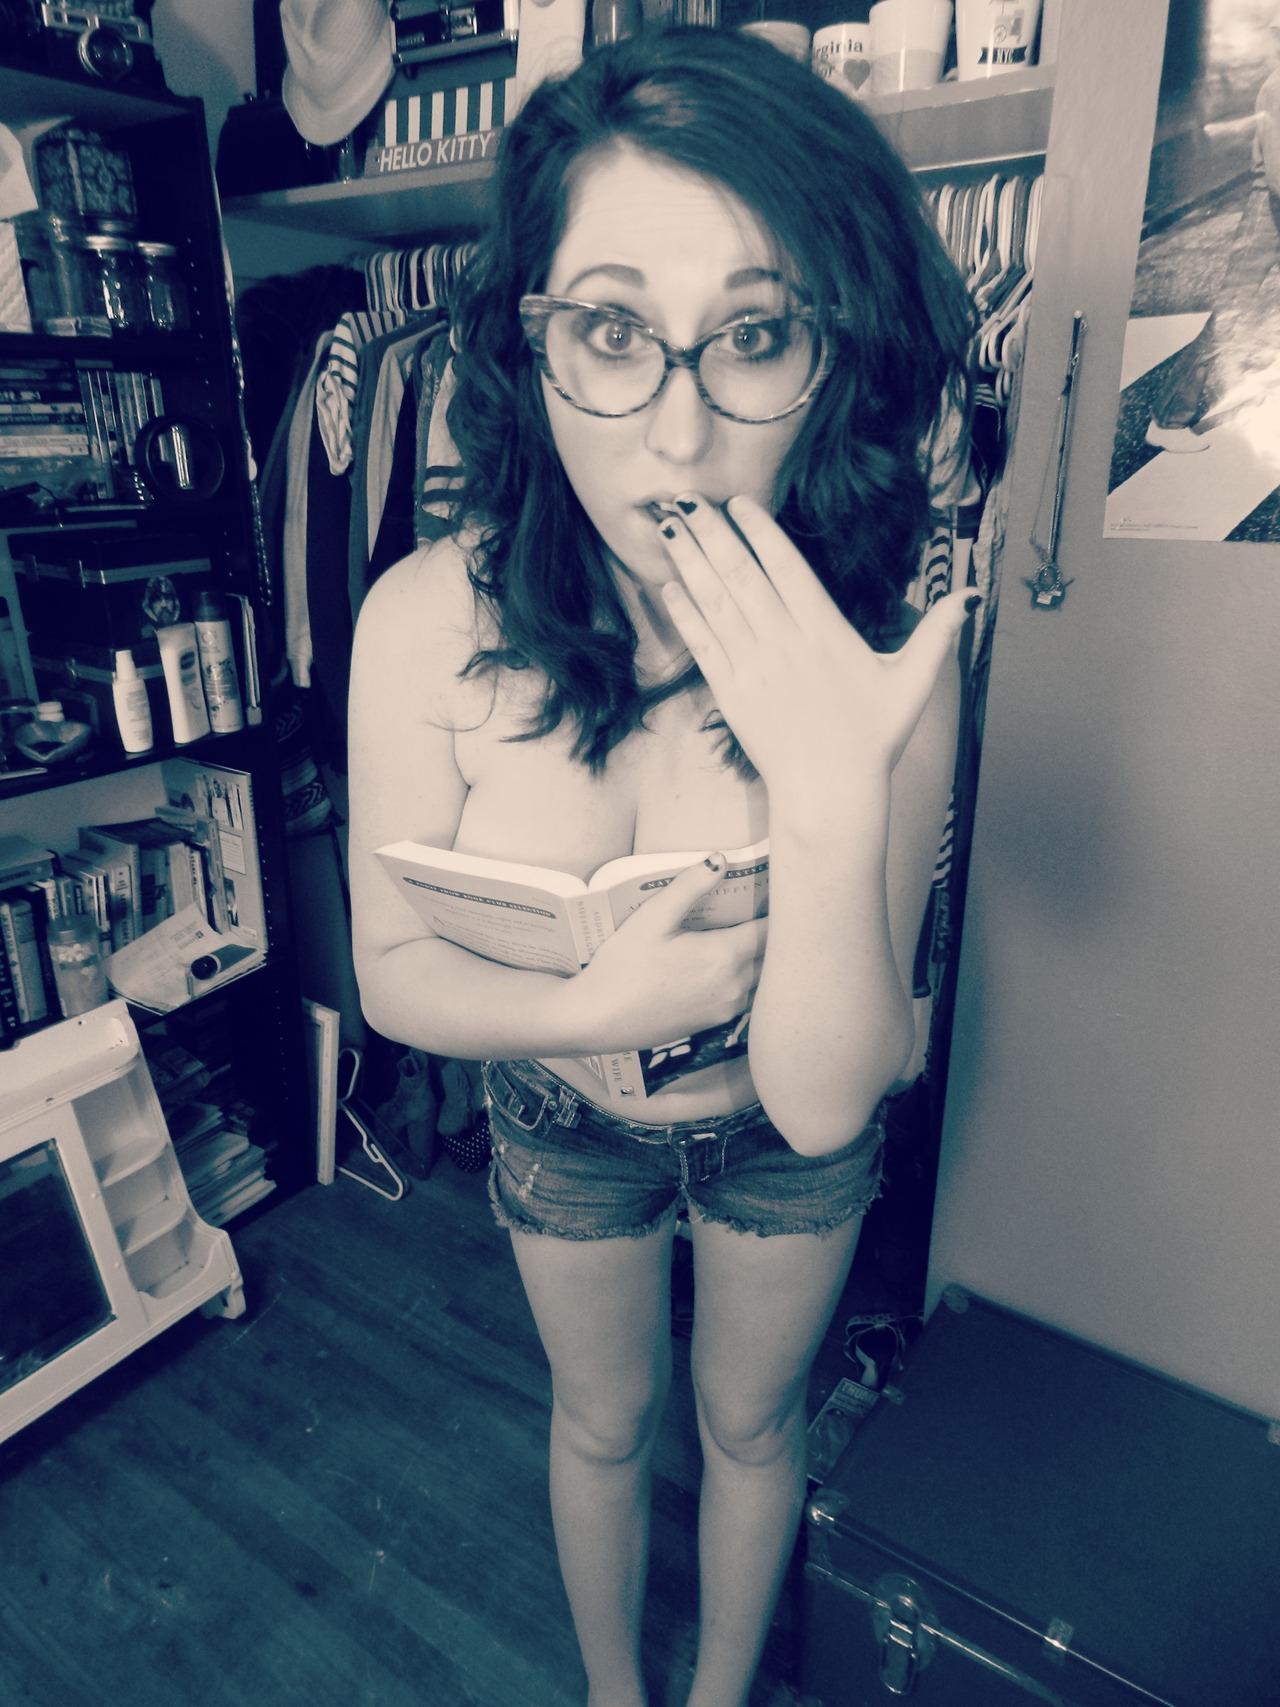 nerd-gostosa-peladinha (10)